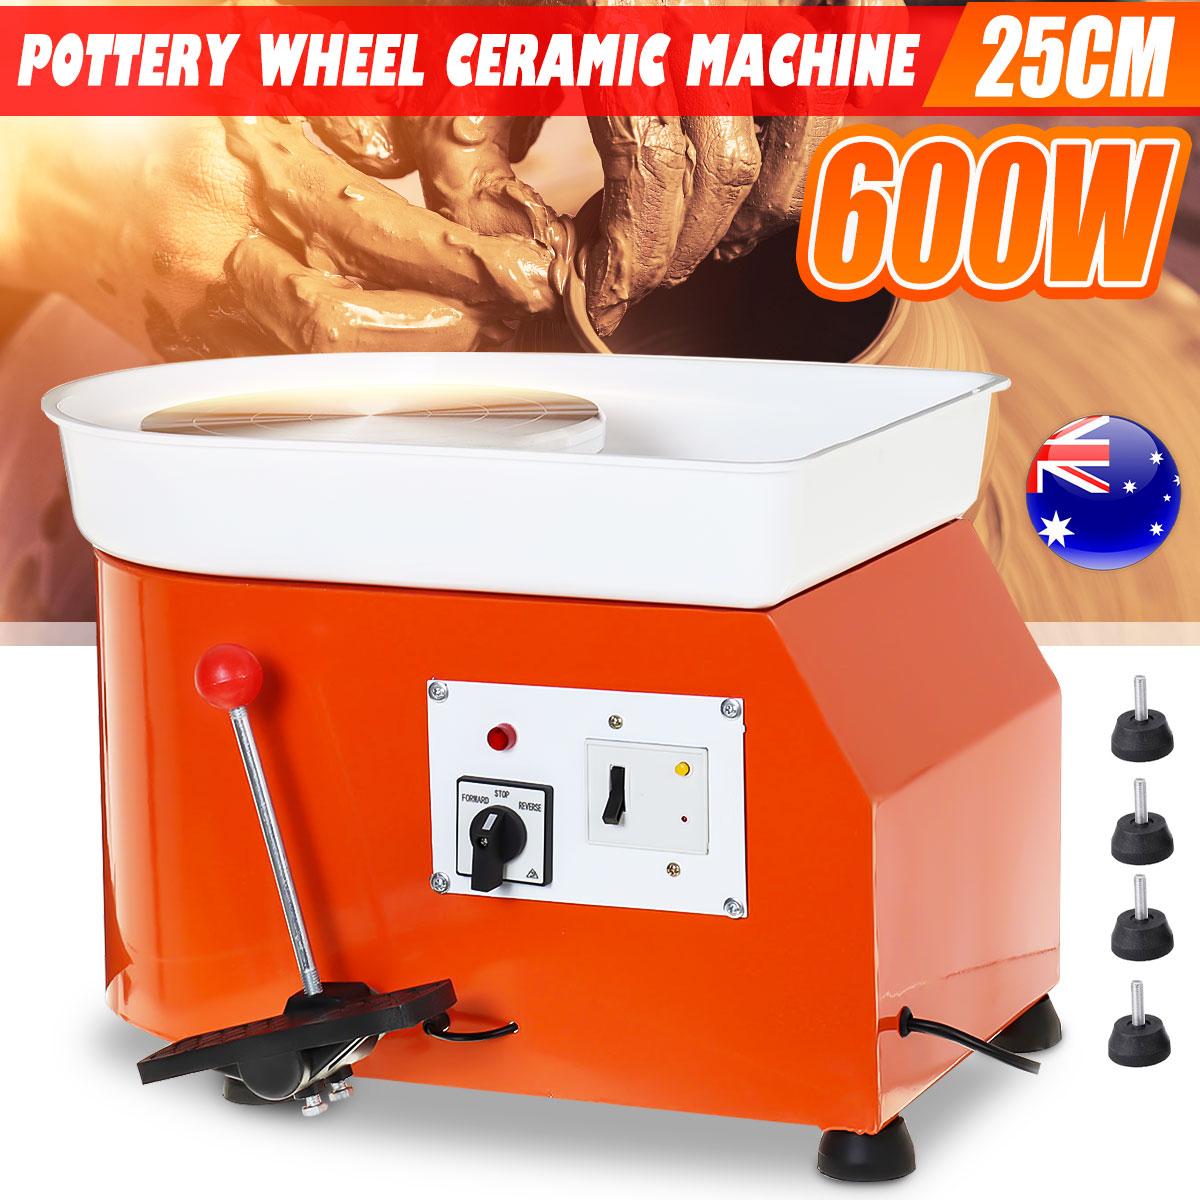 DIY 220V 600W Electric Pottery Wheel Ceramic Machine Foot Pedal Clay Pottery Forming Ceramic Works Art Work Mould AU Plug